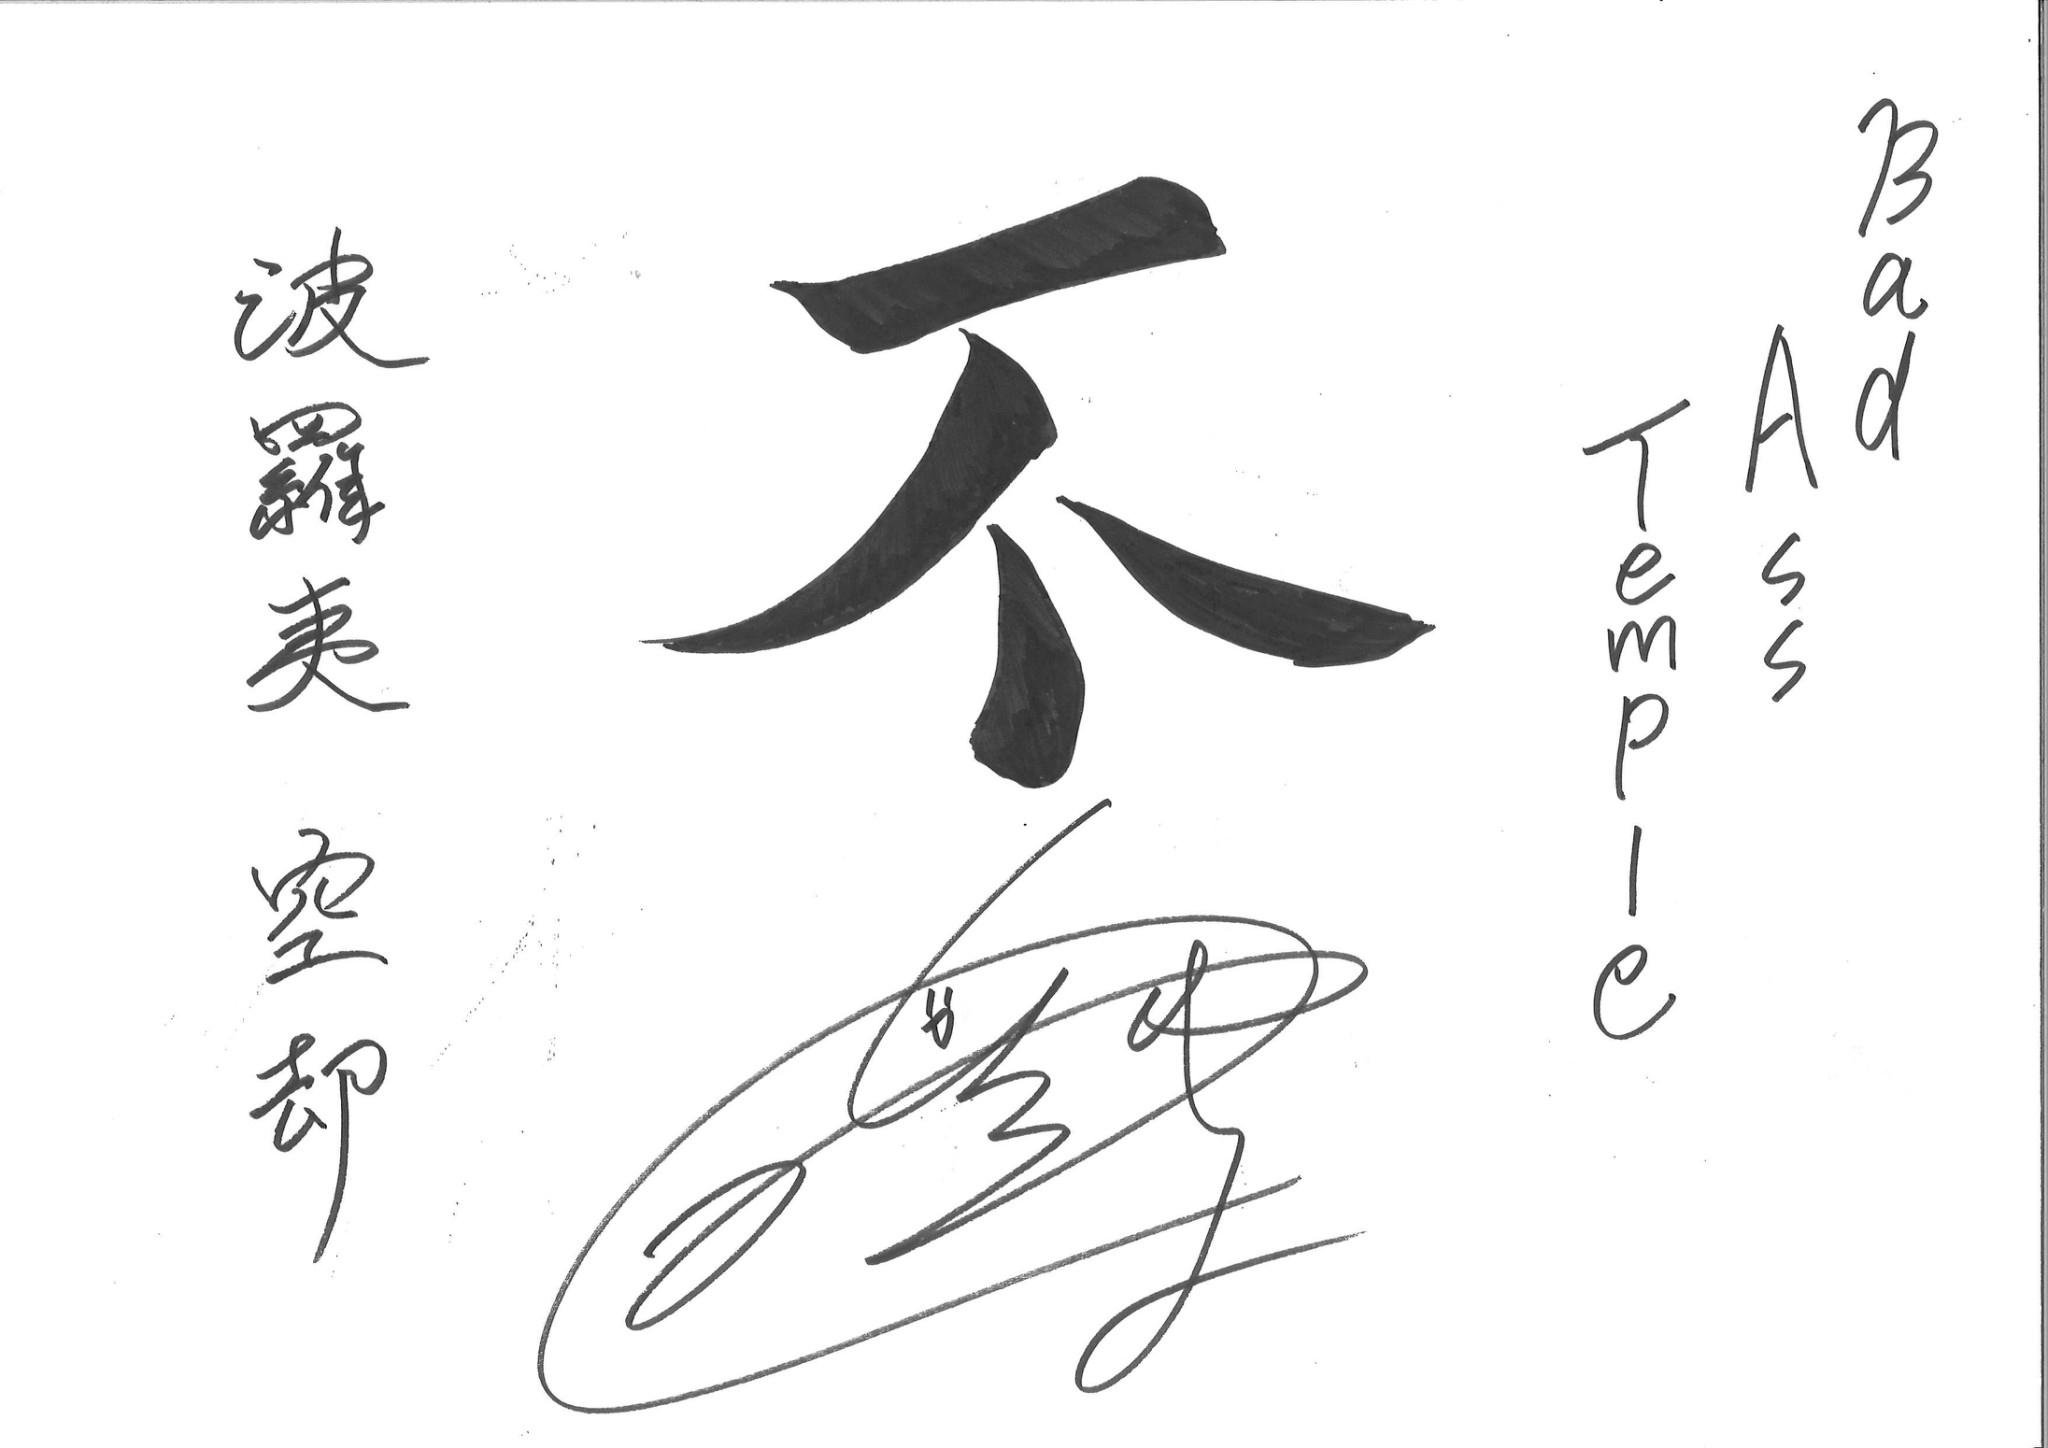 波羅夷 空却 CV:葉山翔太 (C) King Record Co., Ltd. All rights reserved.